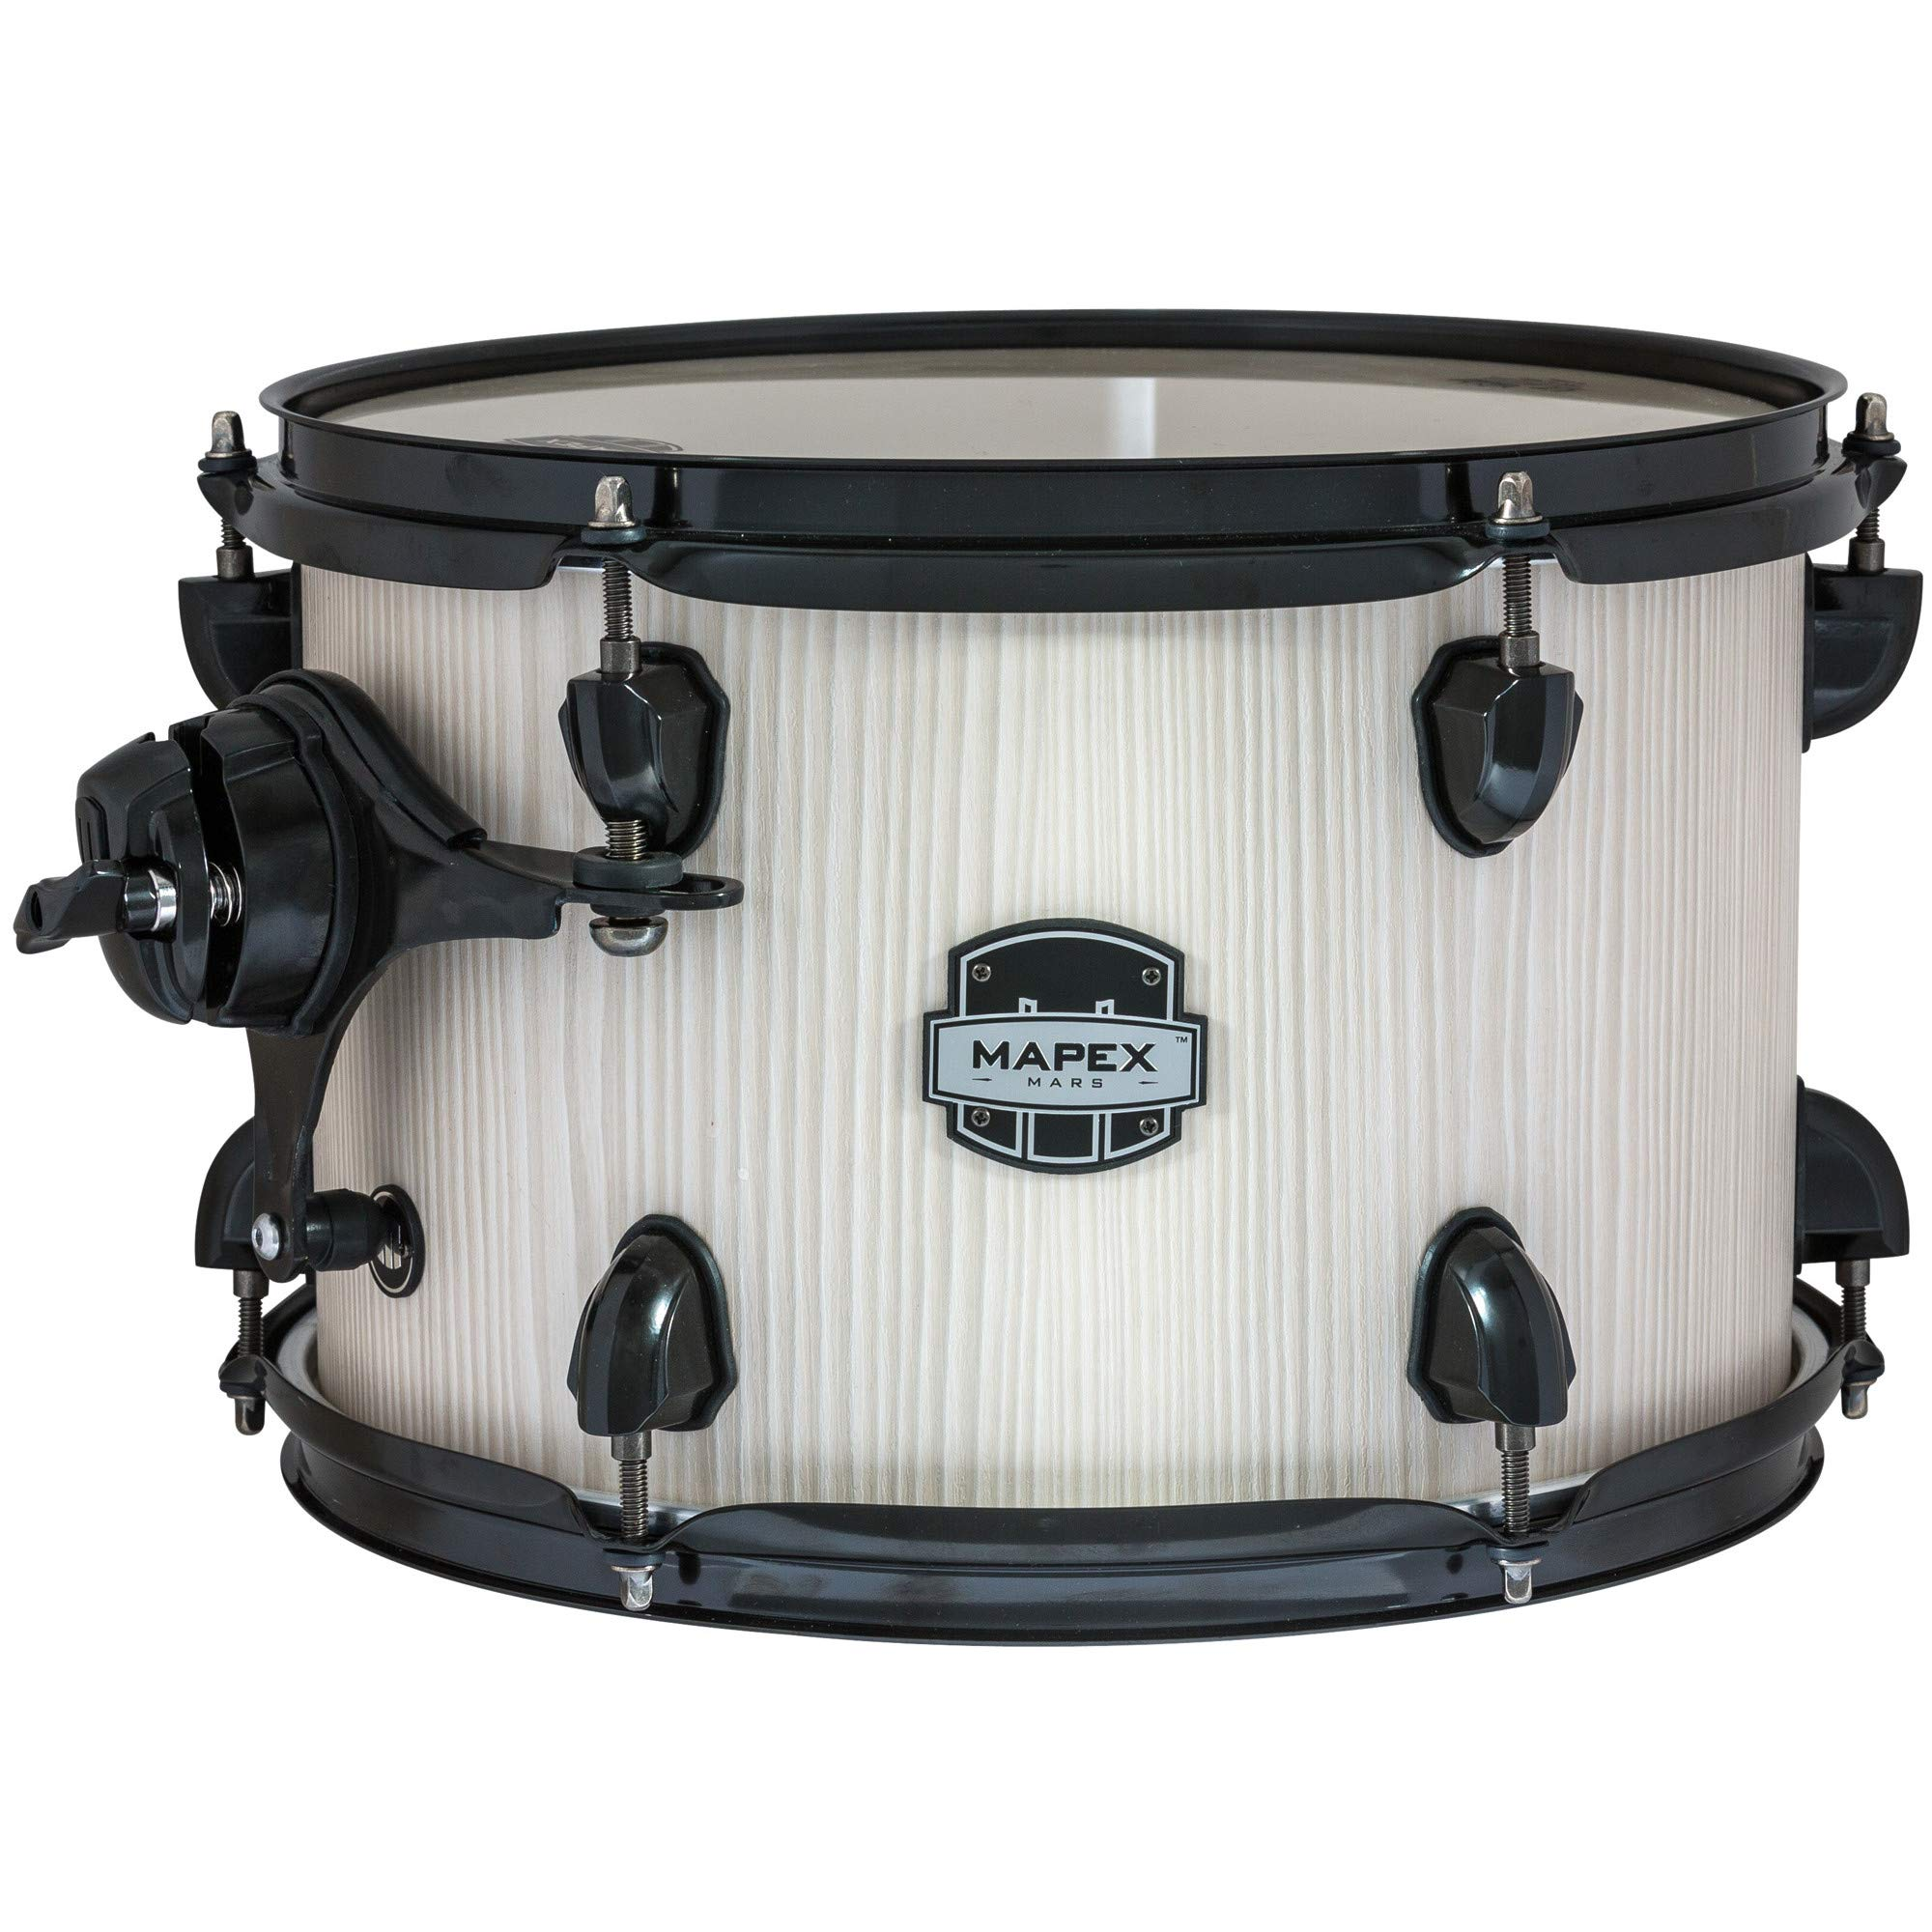 MAPEX Bass Drum MAB2218ABAW